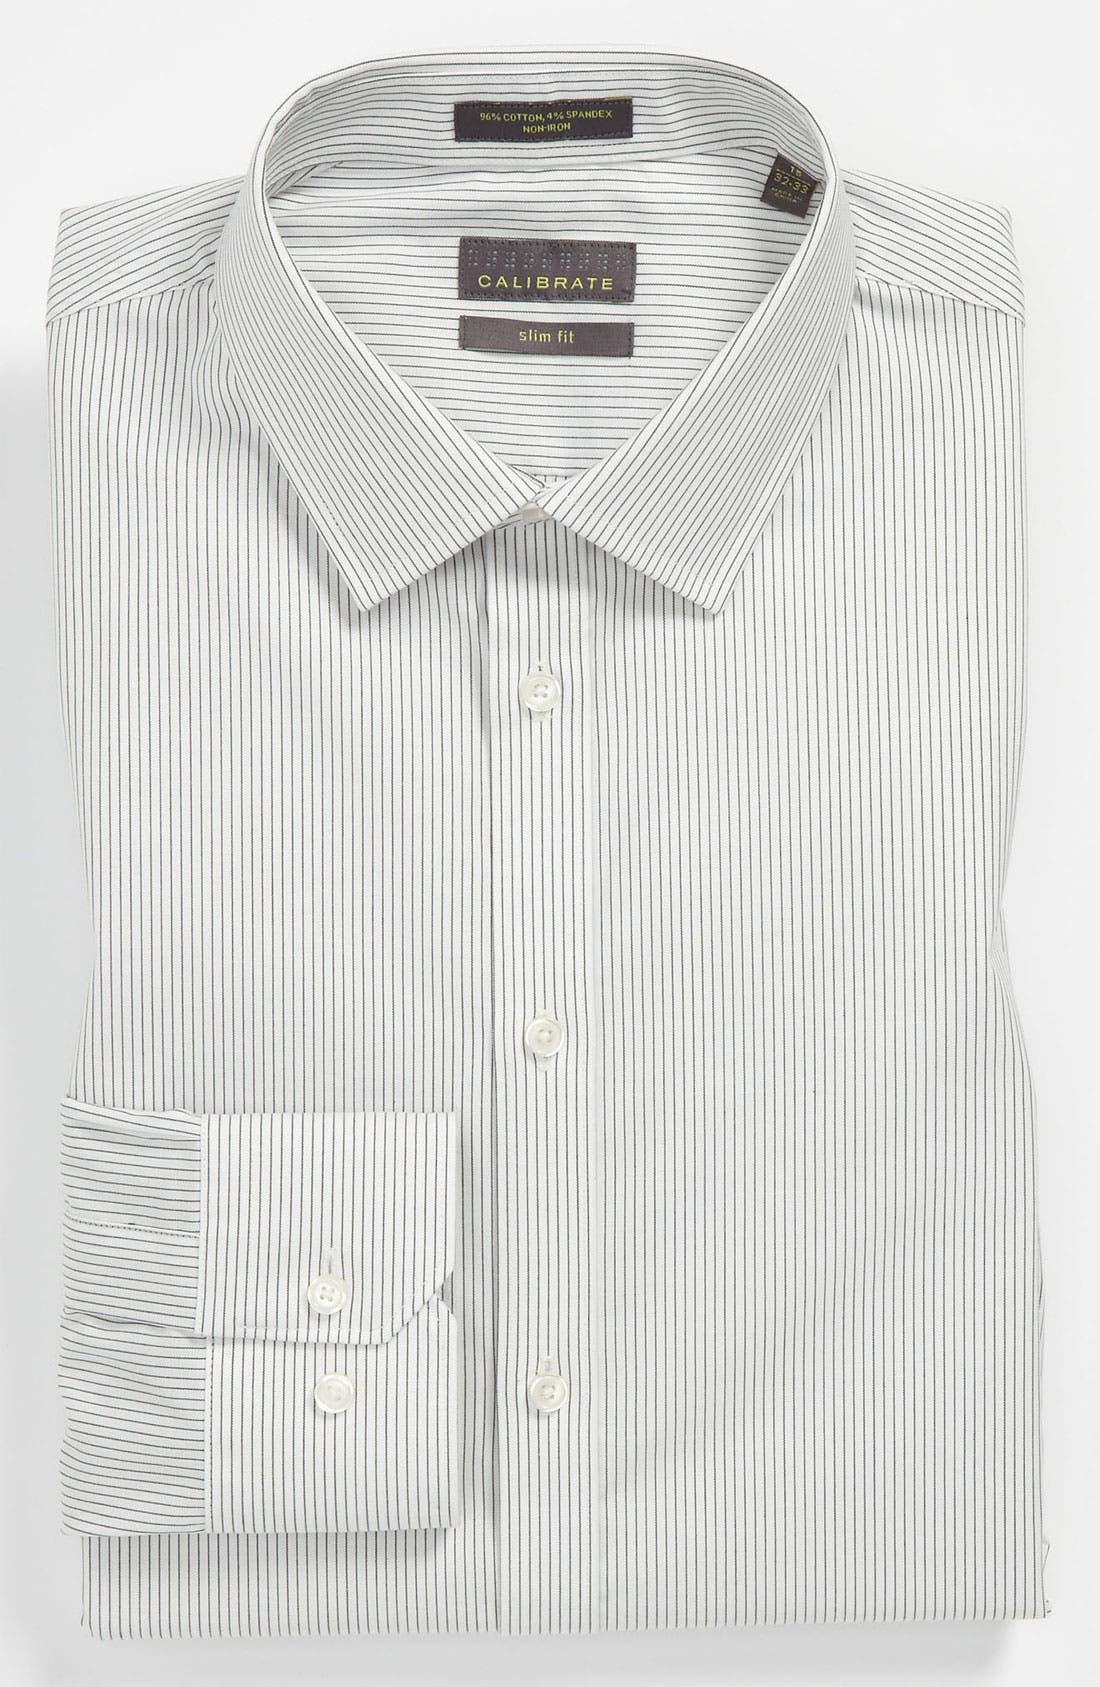 Alternate Image 1 Selected - Calibrate Slim Fit Non-Iron Dress Shirt